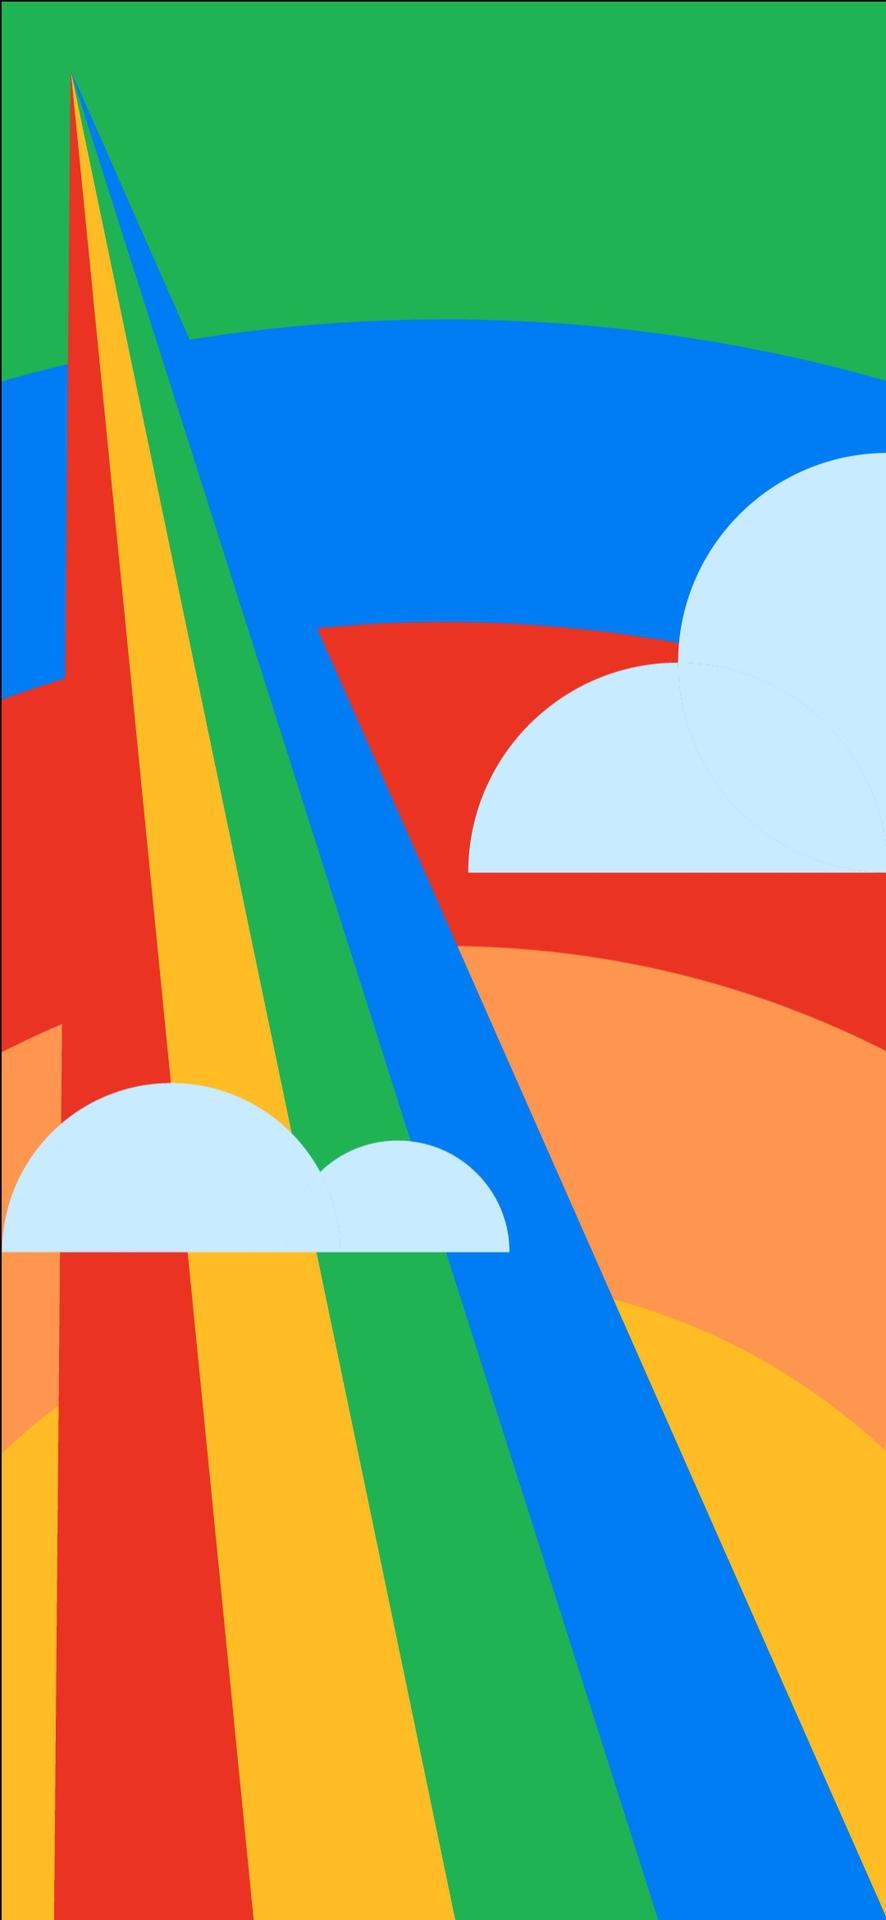 Google Pixel 4a wallpapers 13